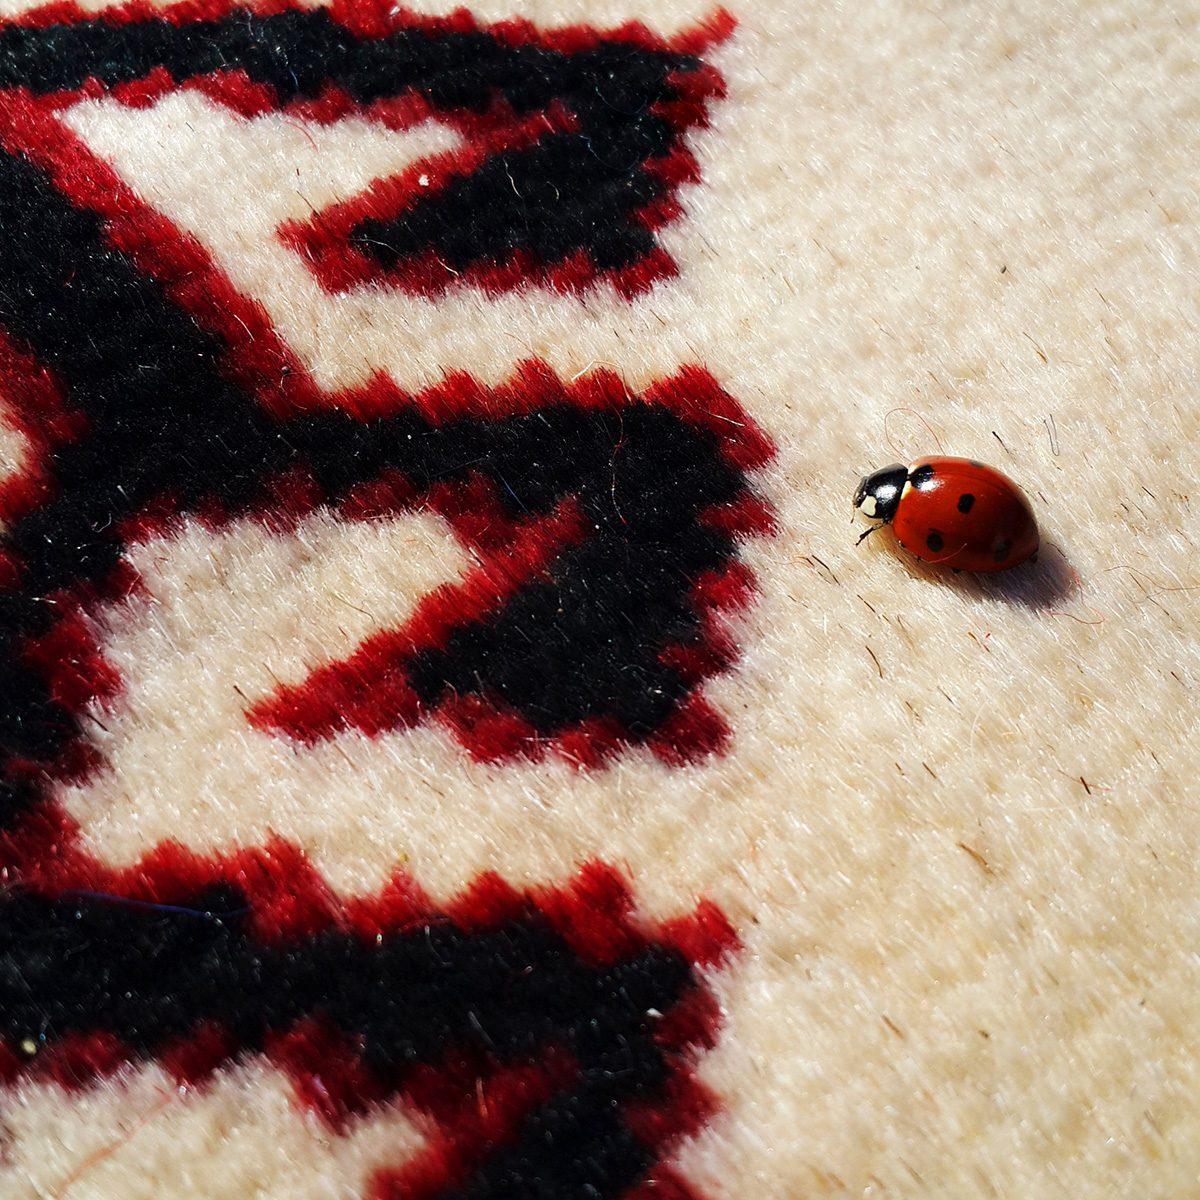 lady bug on rug